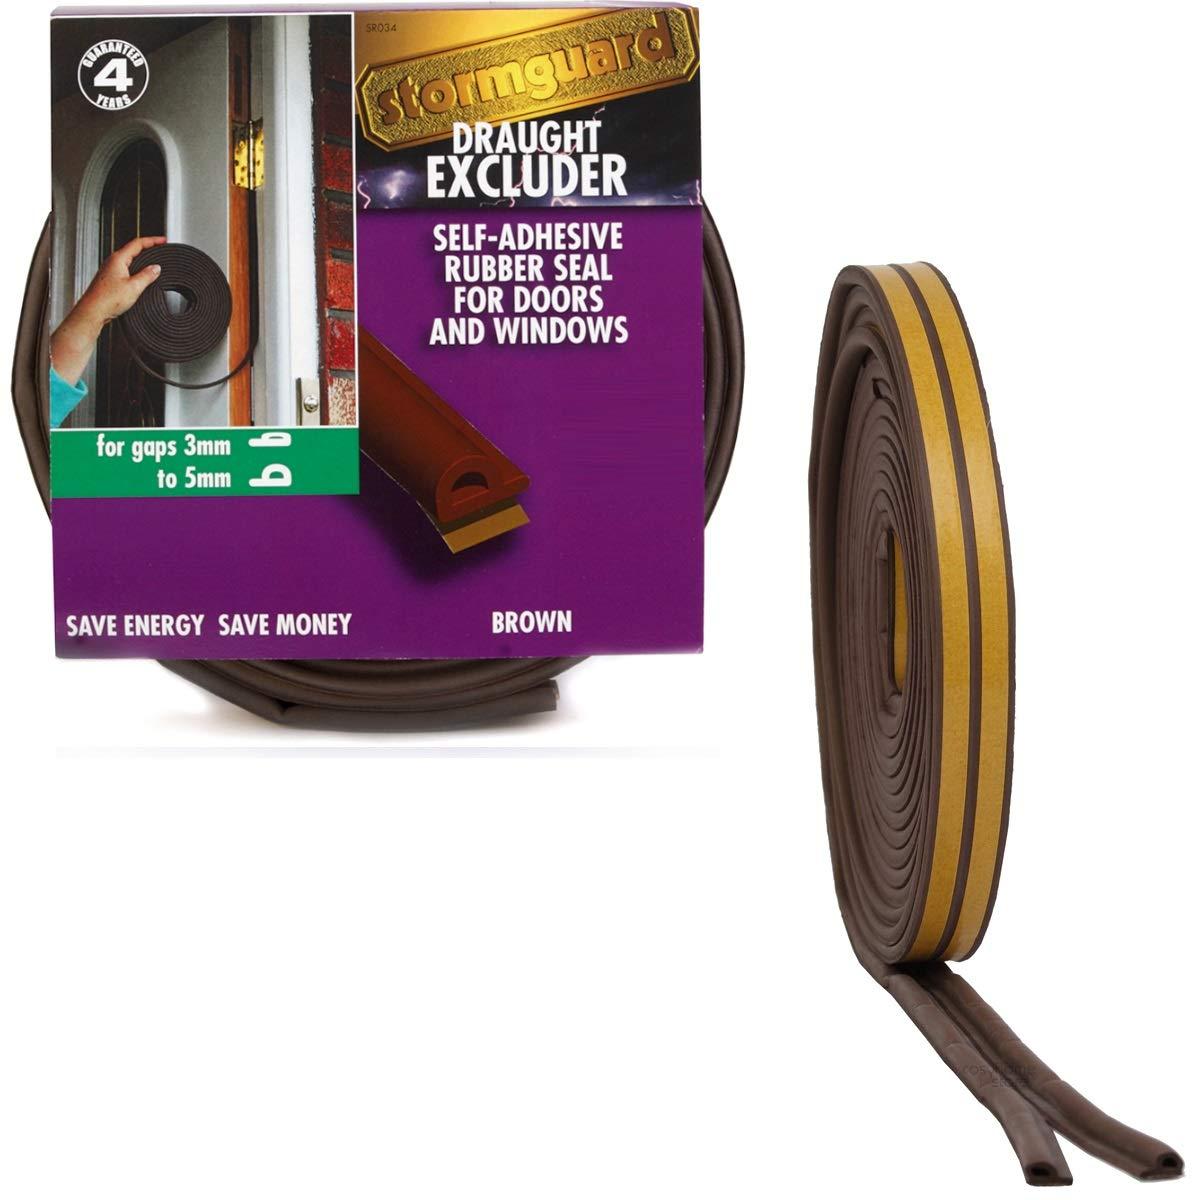 EPDM Self Adhesive Rubber Seal P for 3 to 5mm gaps 12m BLACK Stormguard